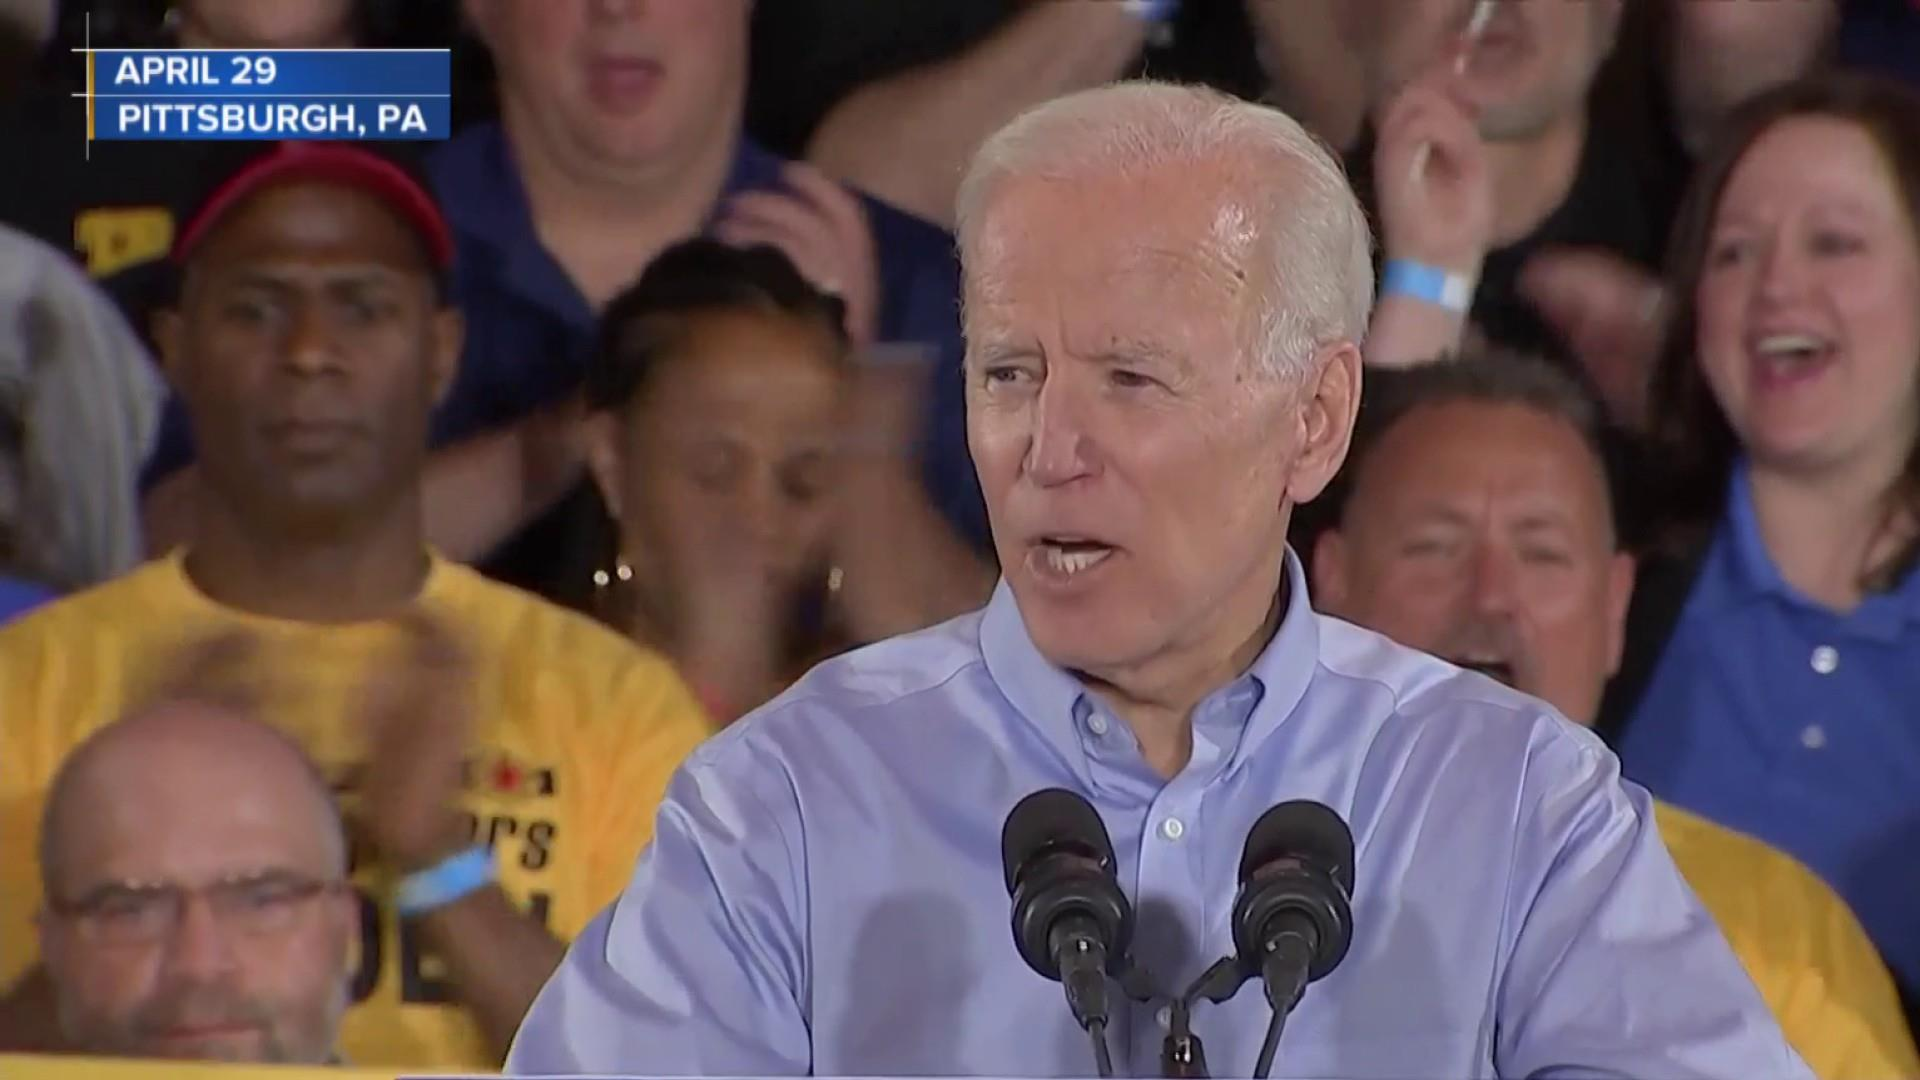 Joe Biden leads in Pennsylvania polls